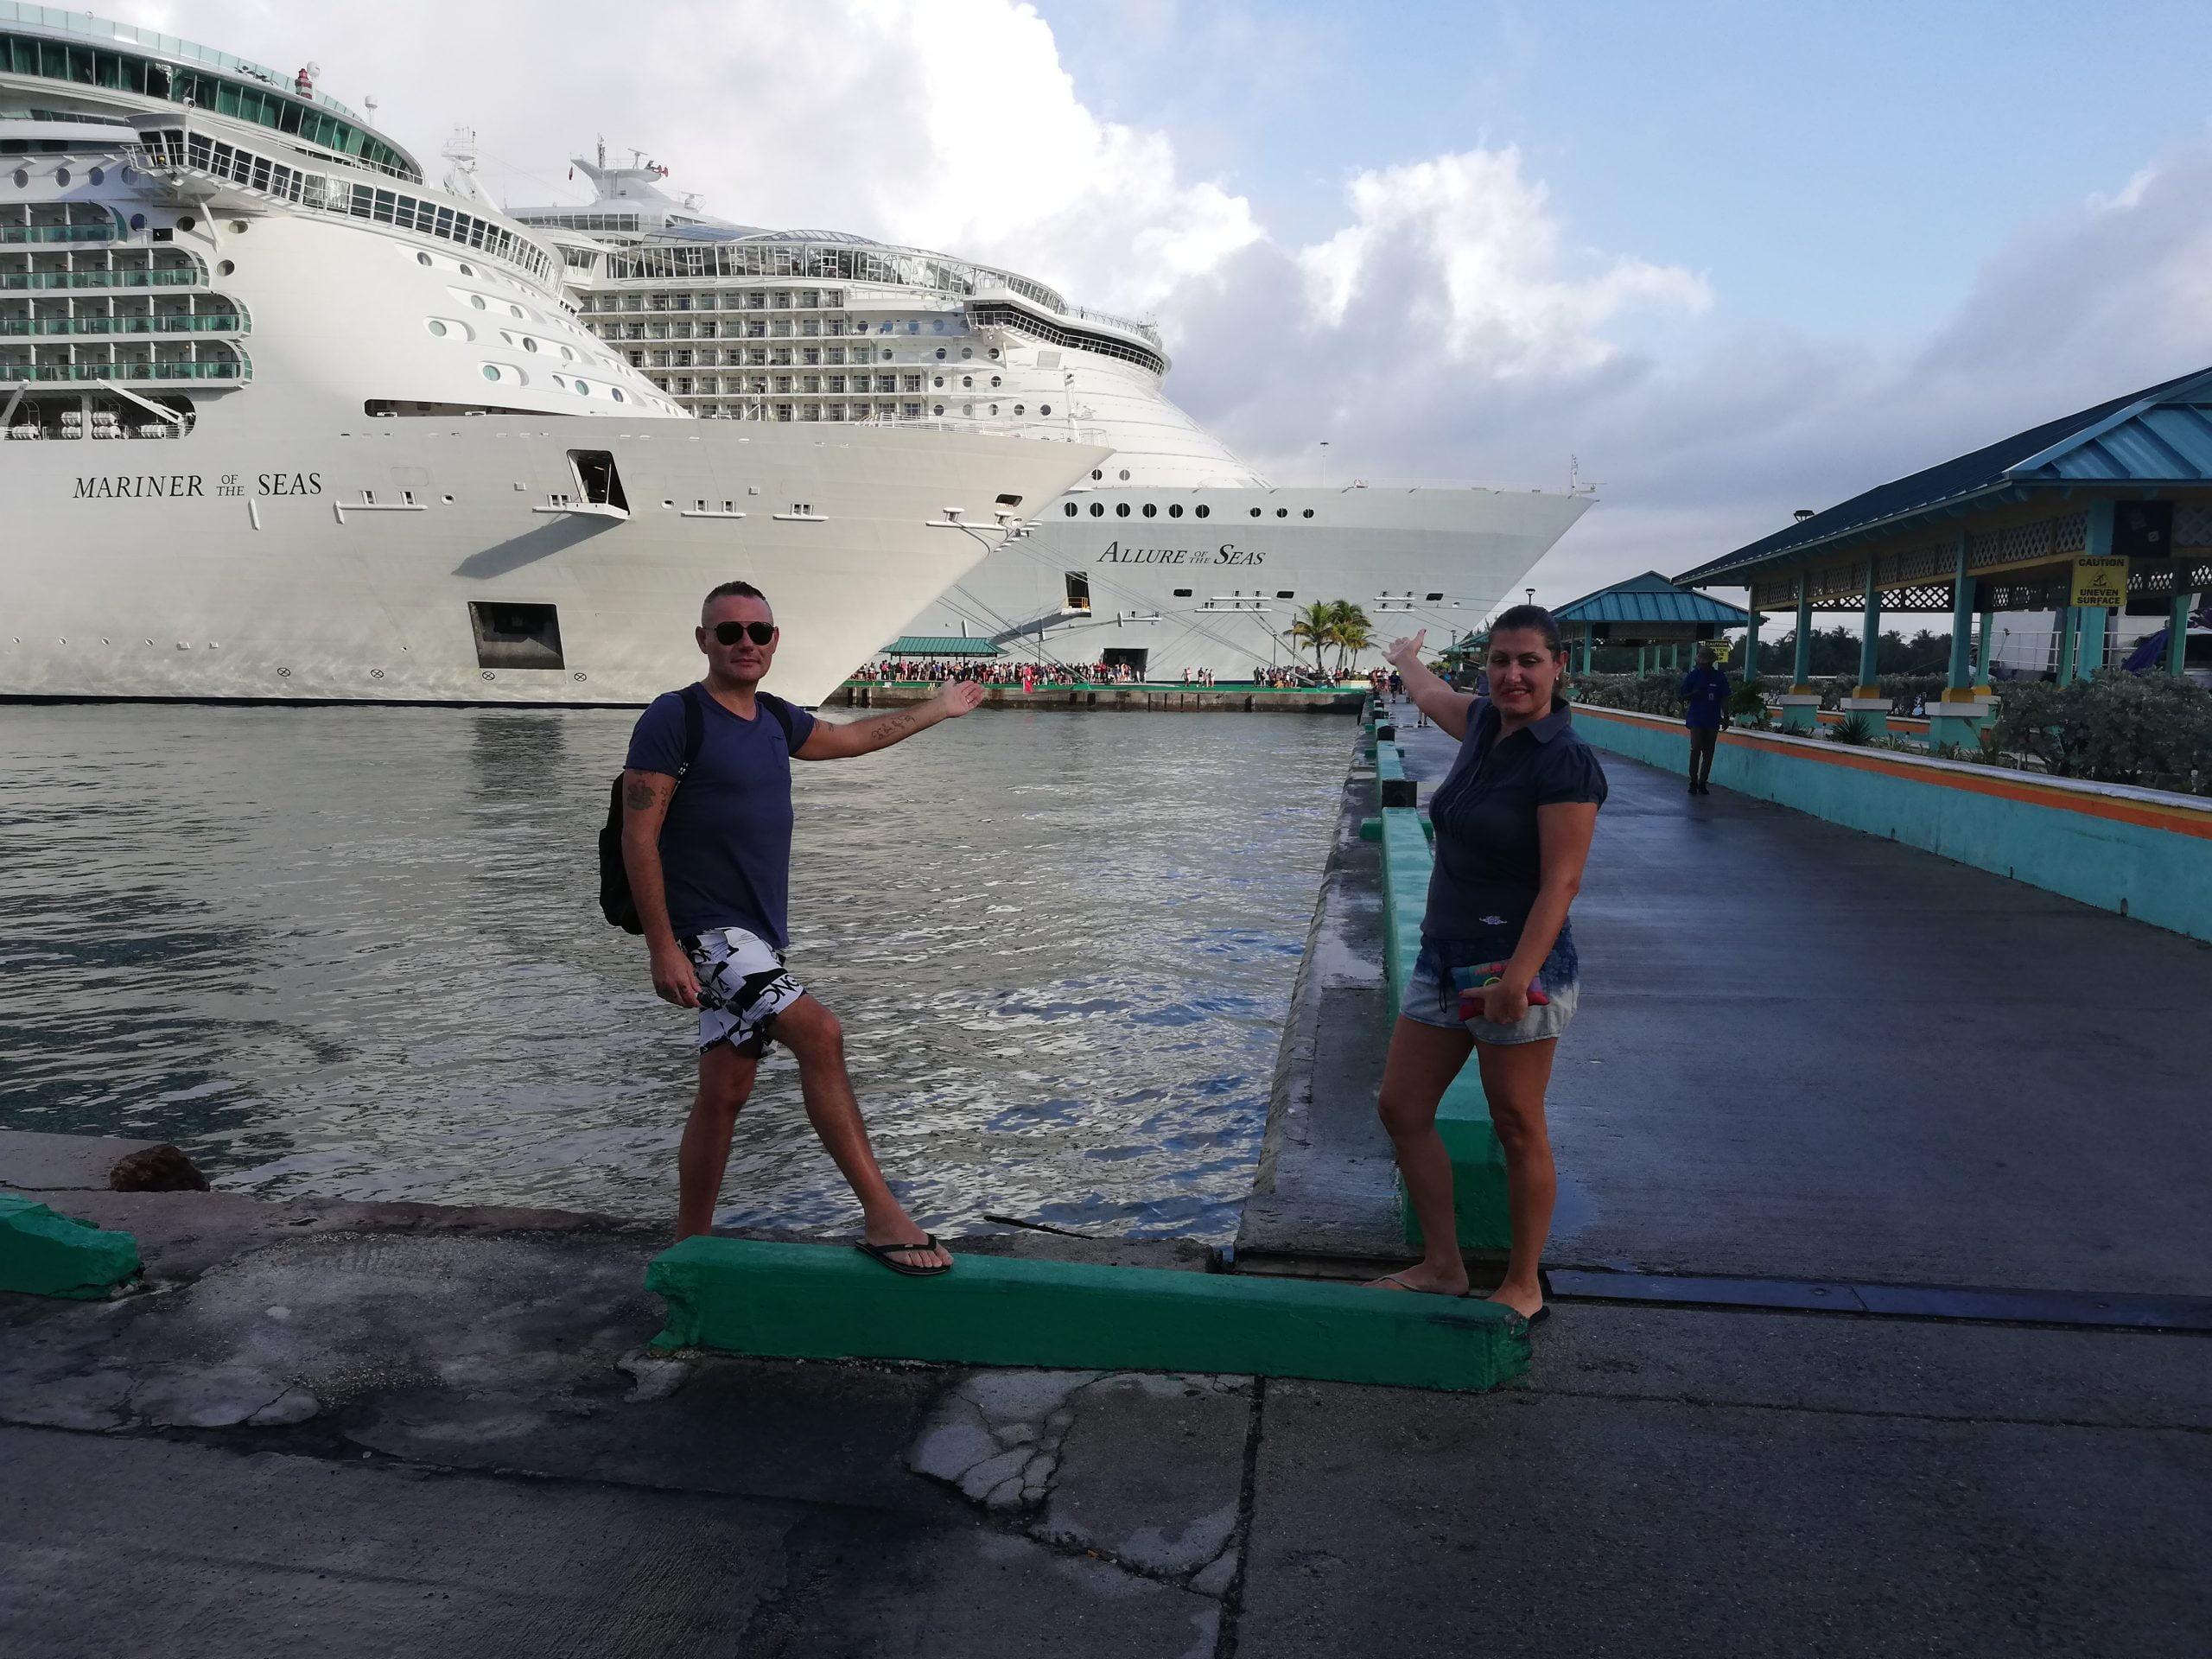 navi della royal caribbean, Mariner e Allure